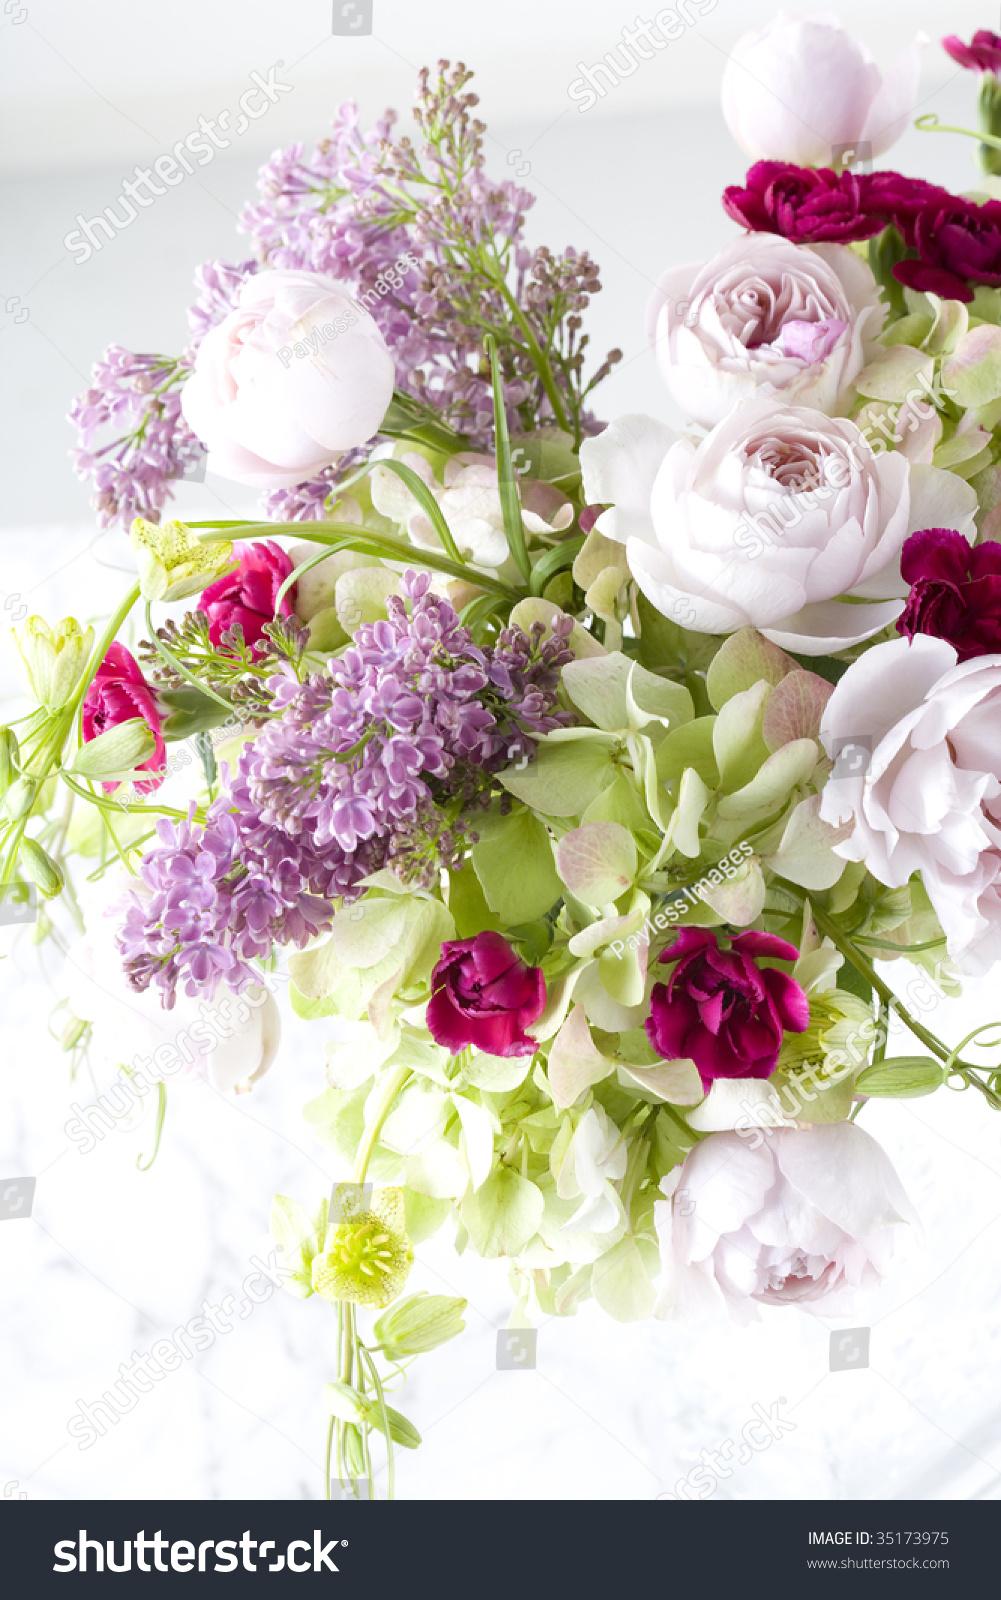 Beautiful flower arrangement vase stock photo edit now 35173975 a beautiful flower arrangement in a vase izmirmasajfo